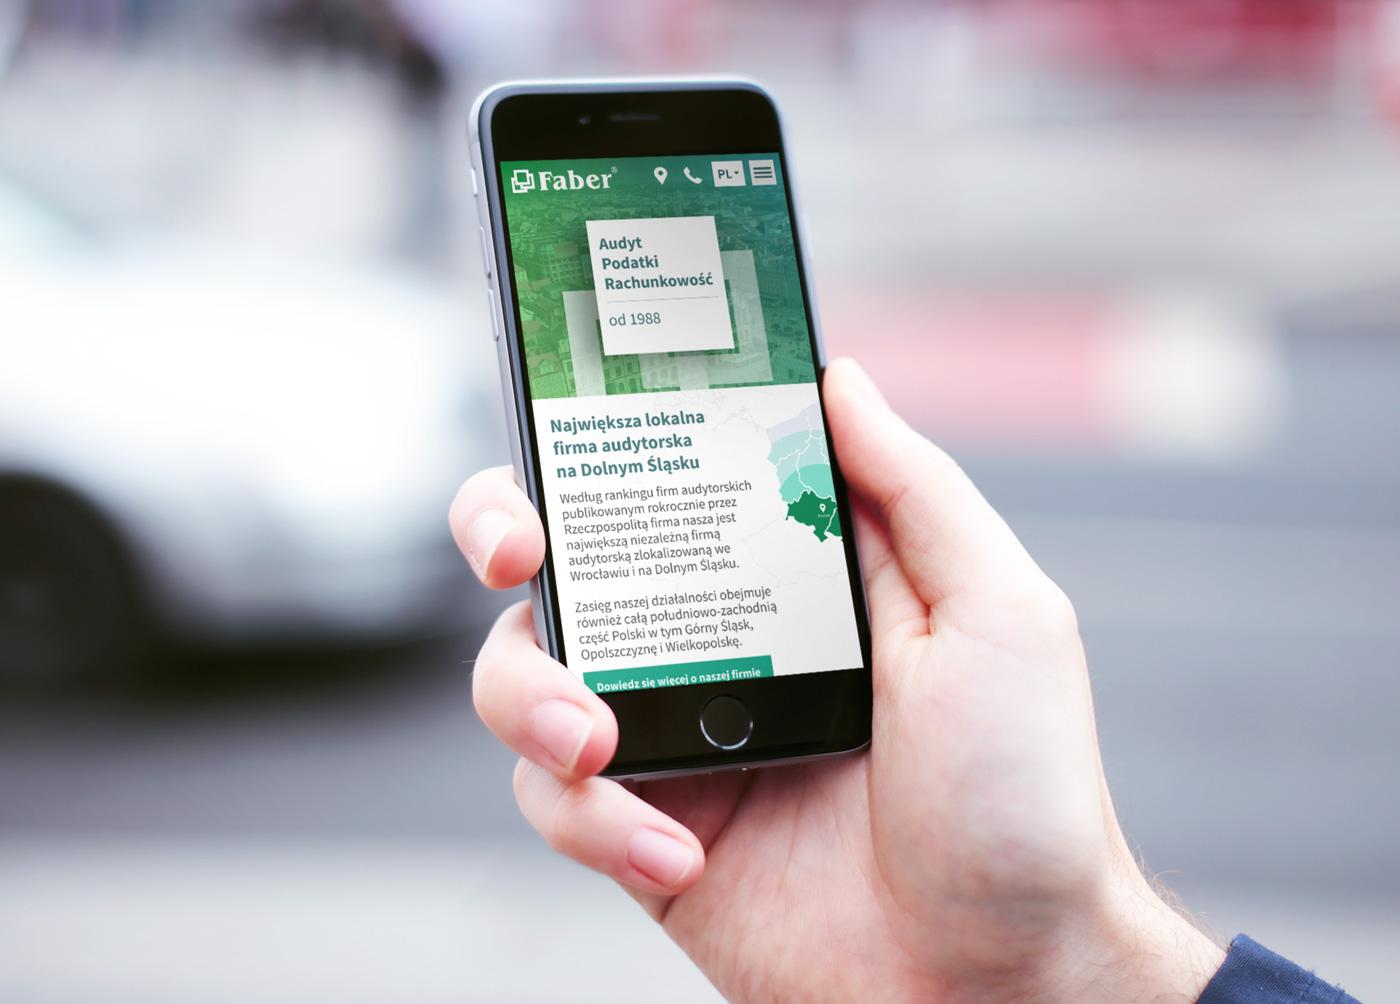 Faber - strona internetowa na telefonie mockup